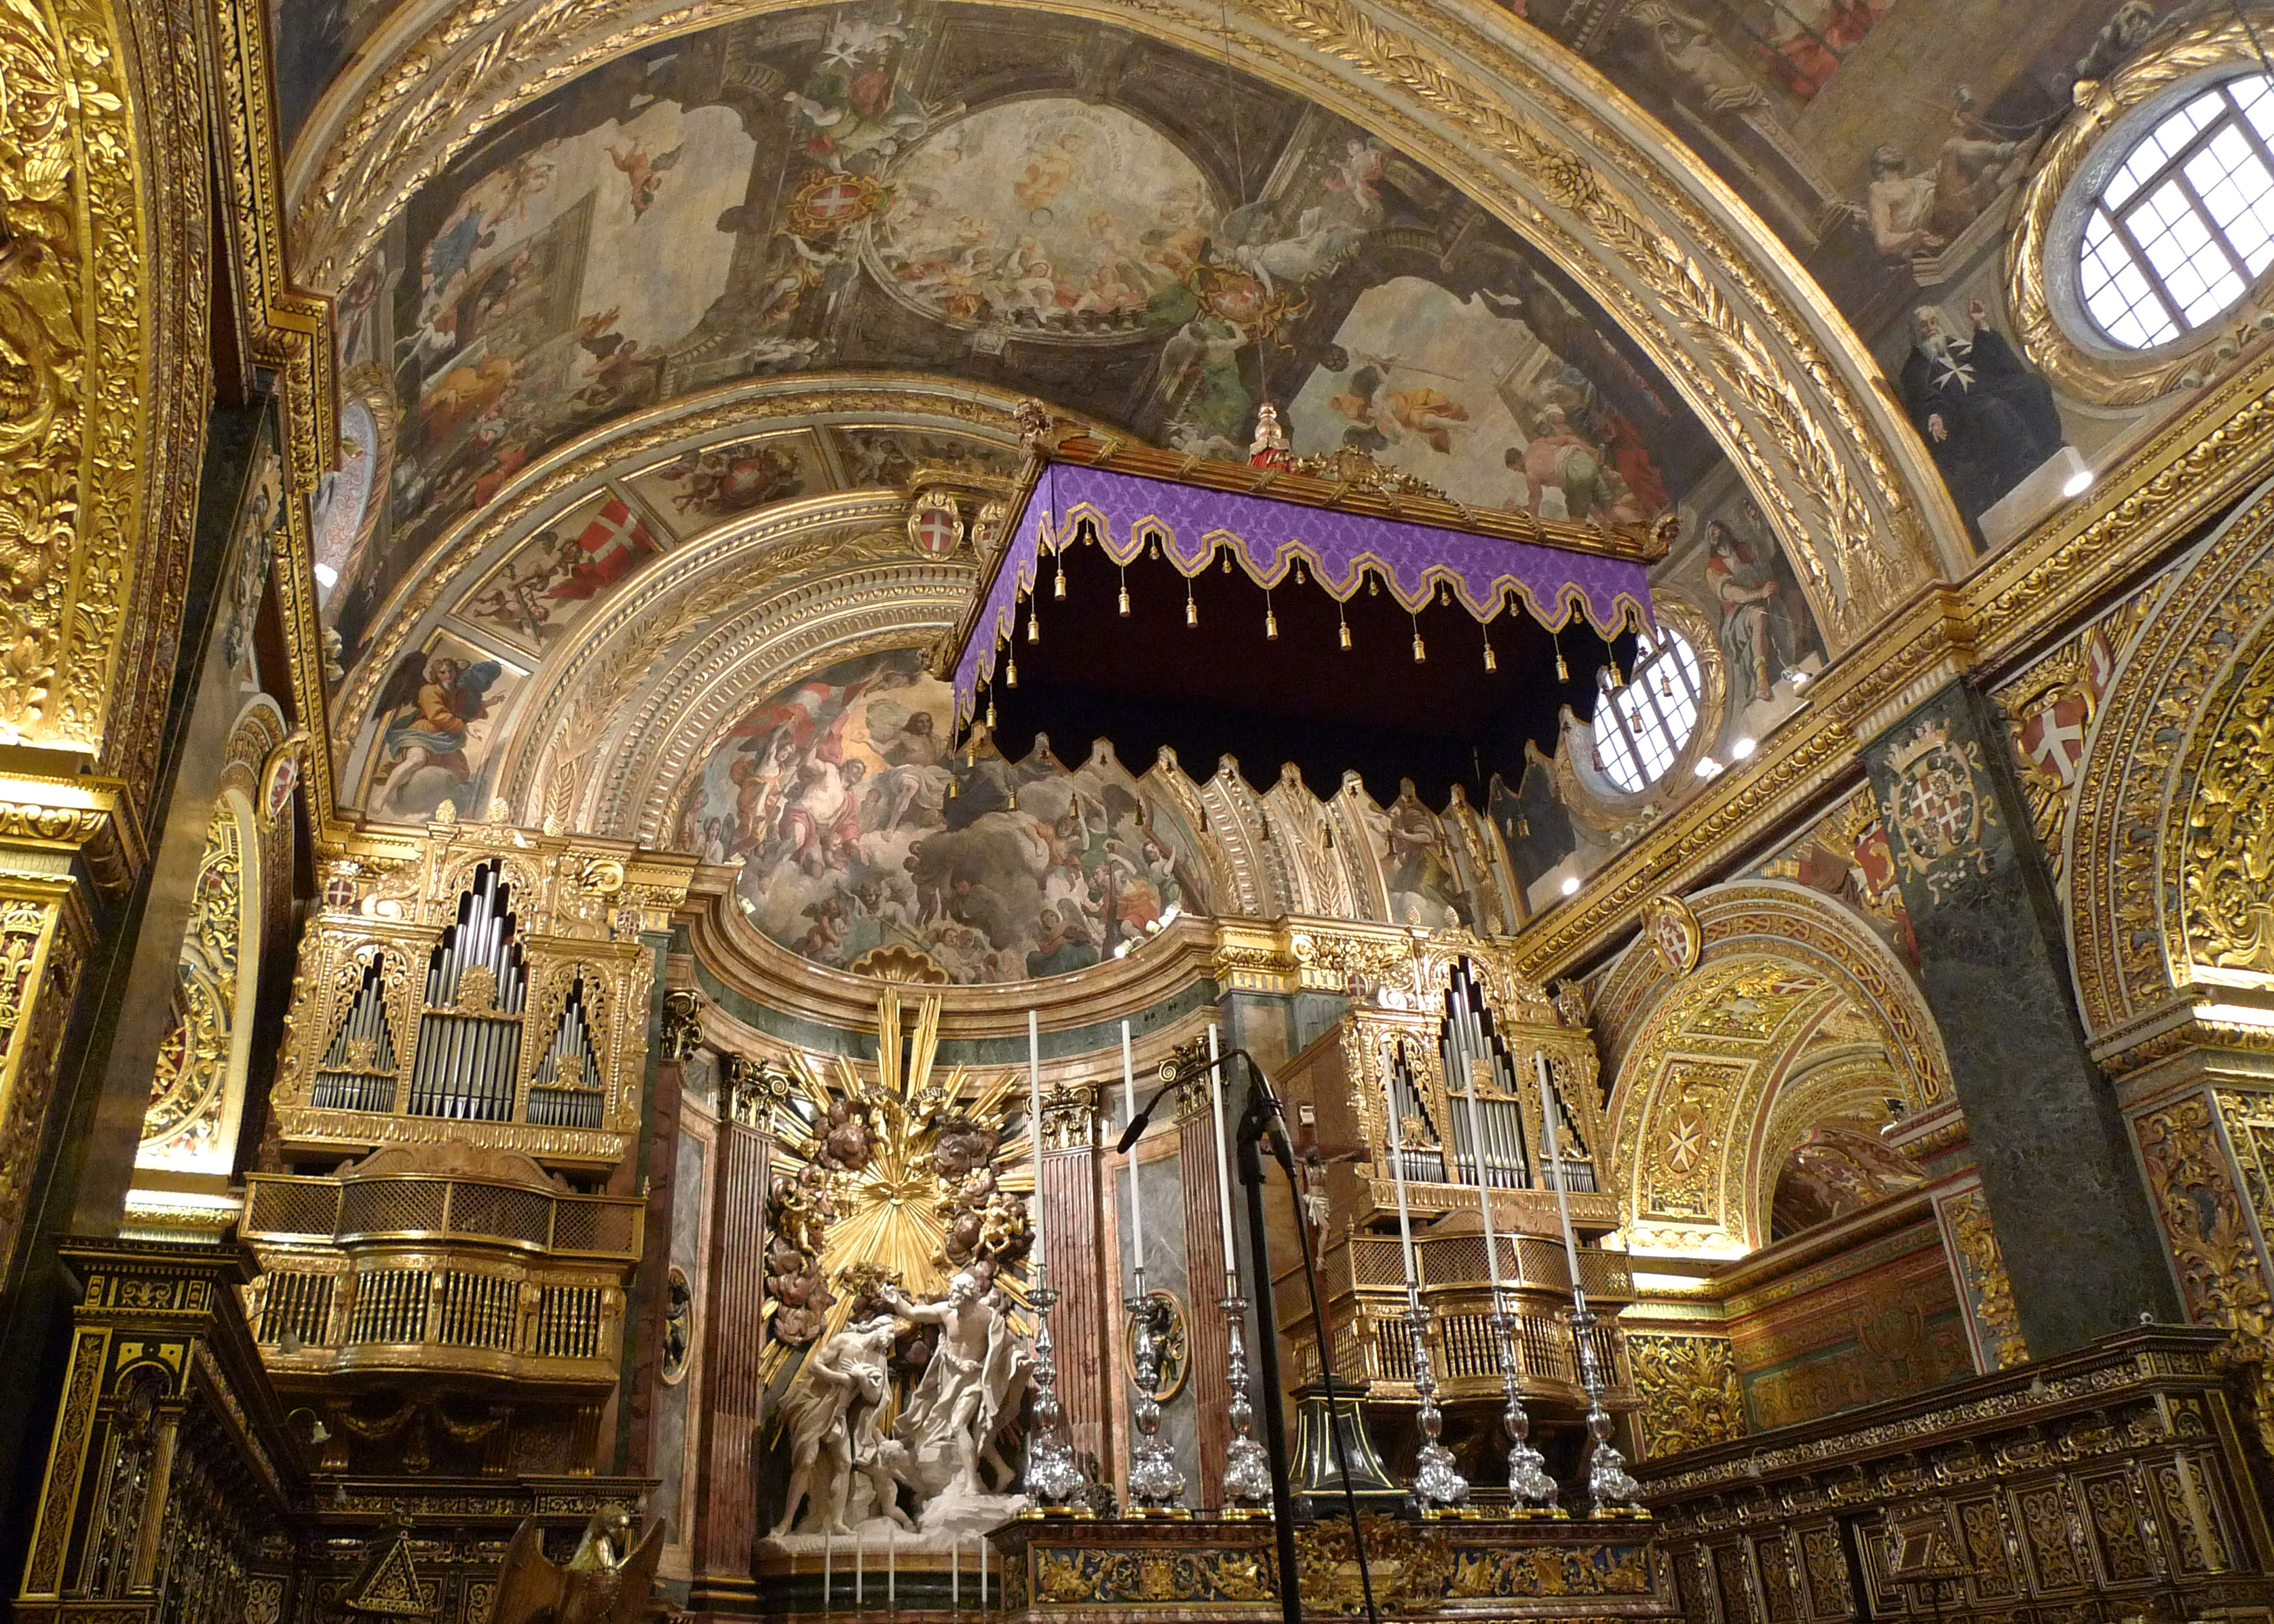 Malta; Altar Canopy, St. John's Co-Cathedral, Valletta